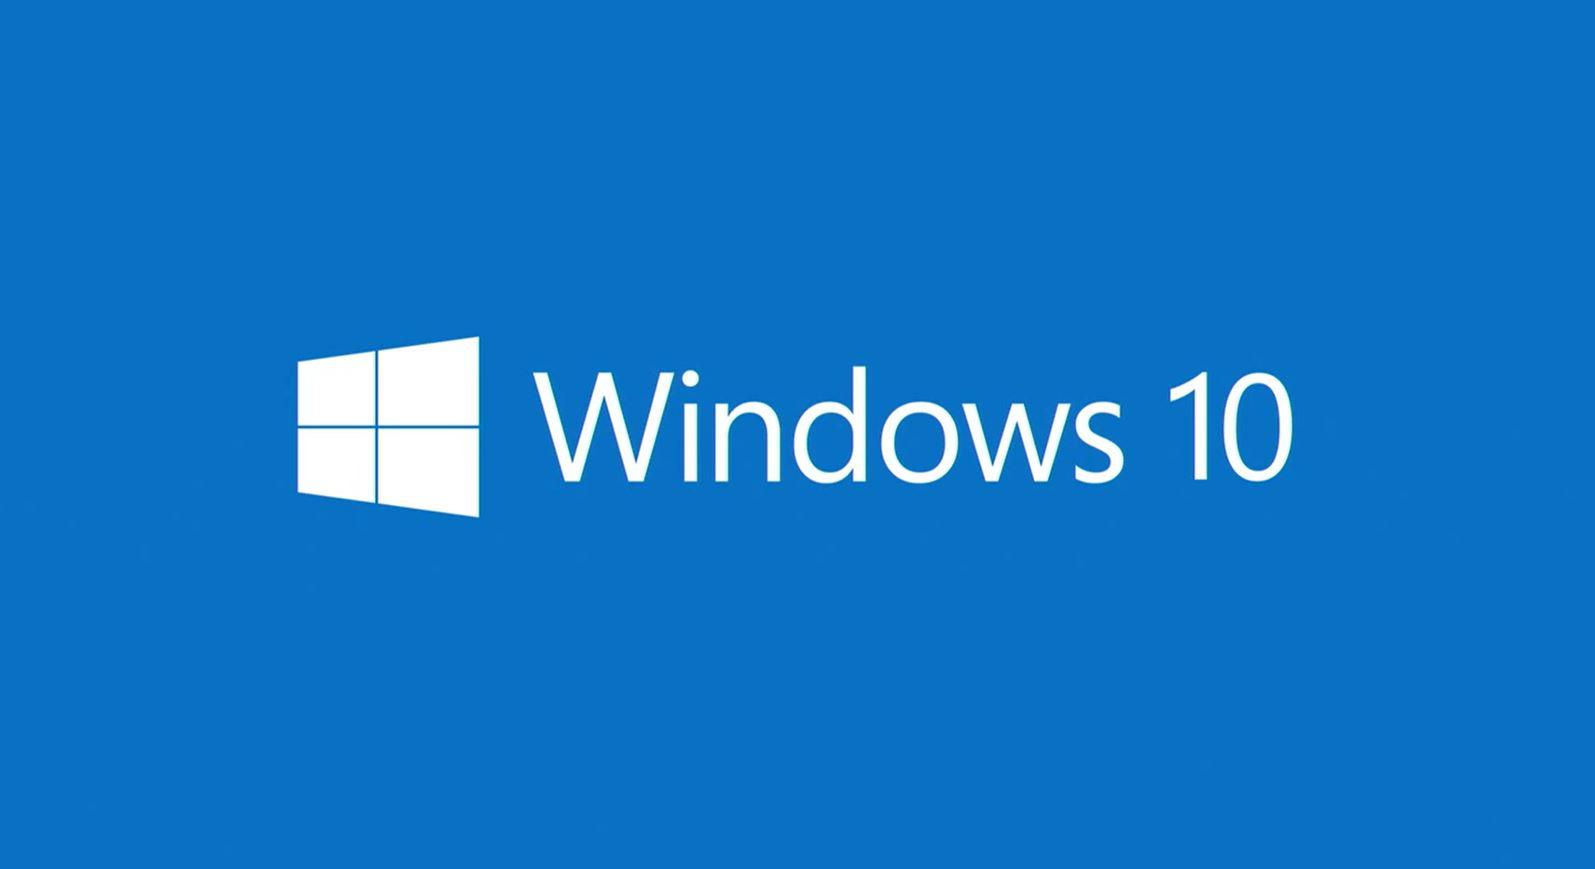 versione di windows